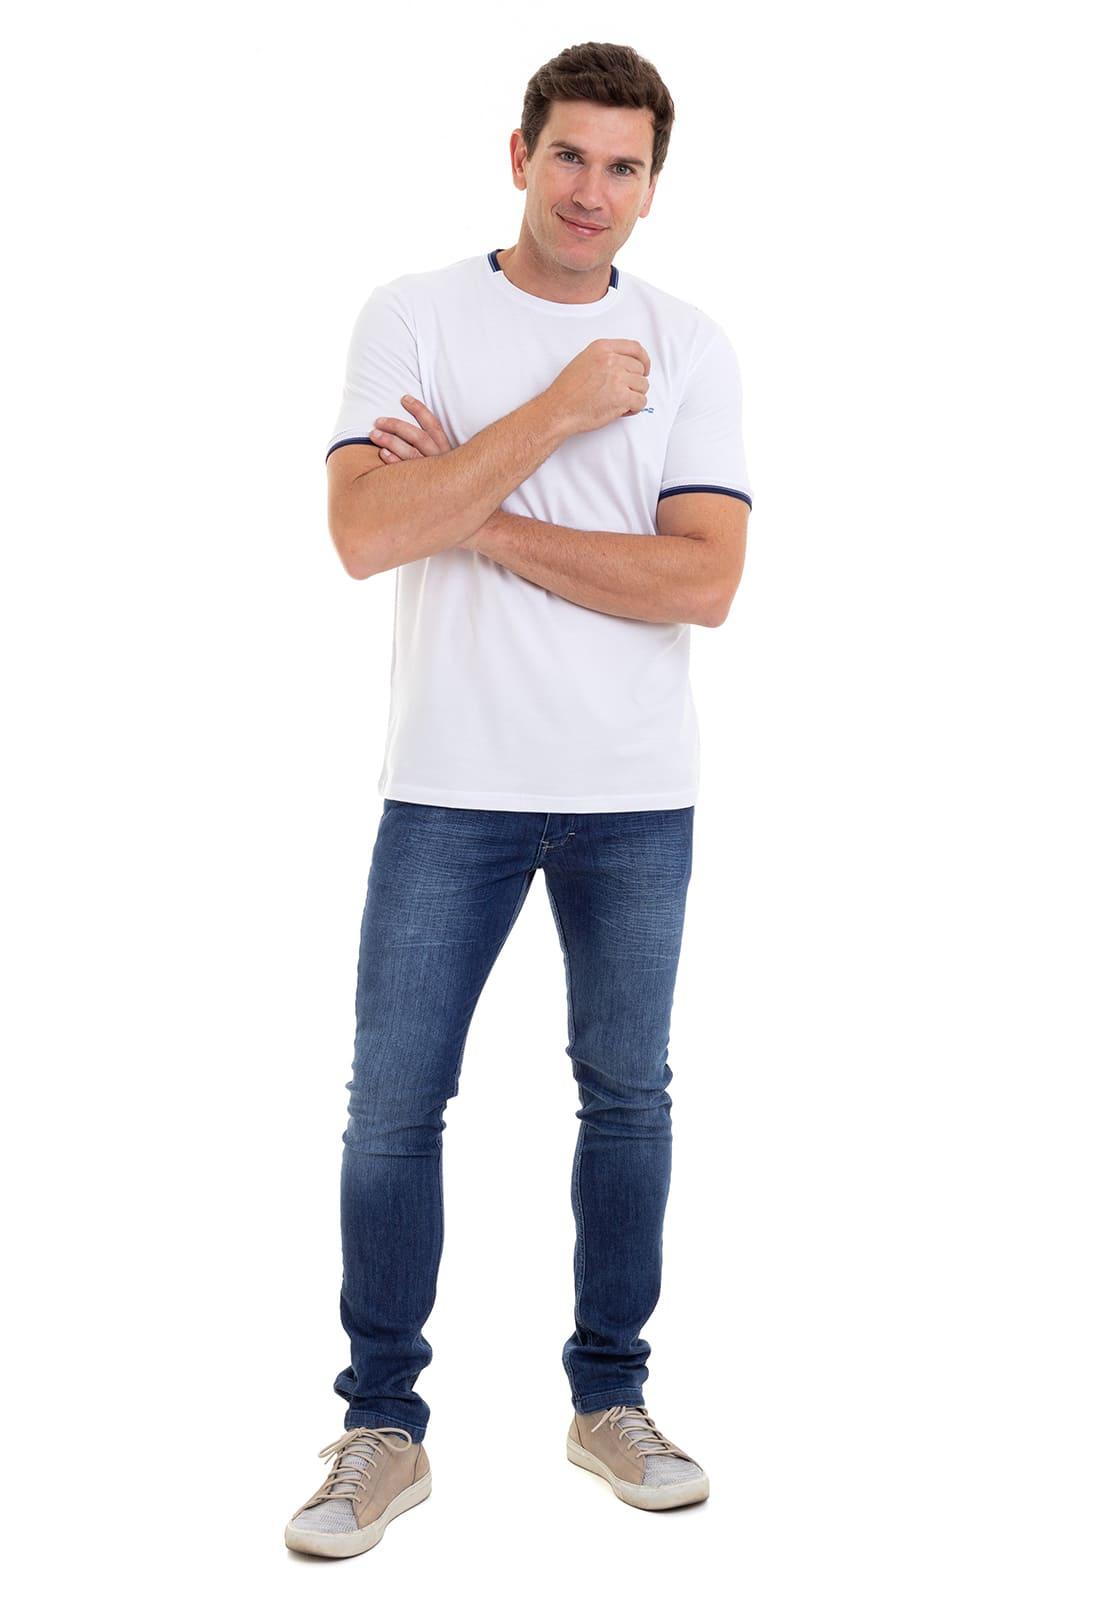 Camiseta Hifen Diferenciada com Detalhes